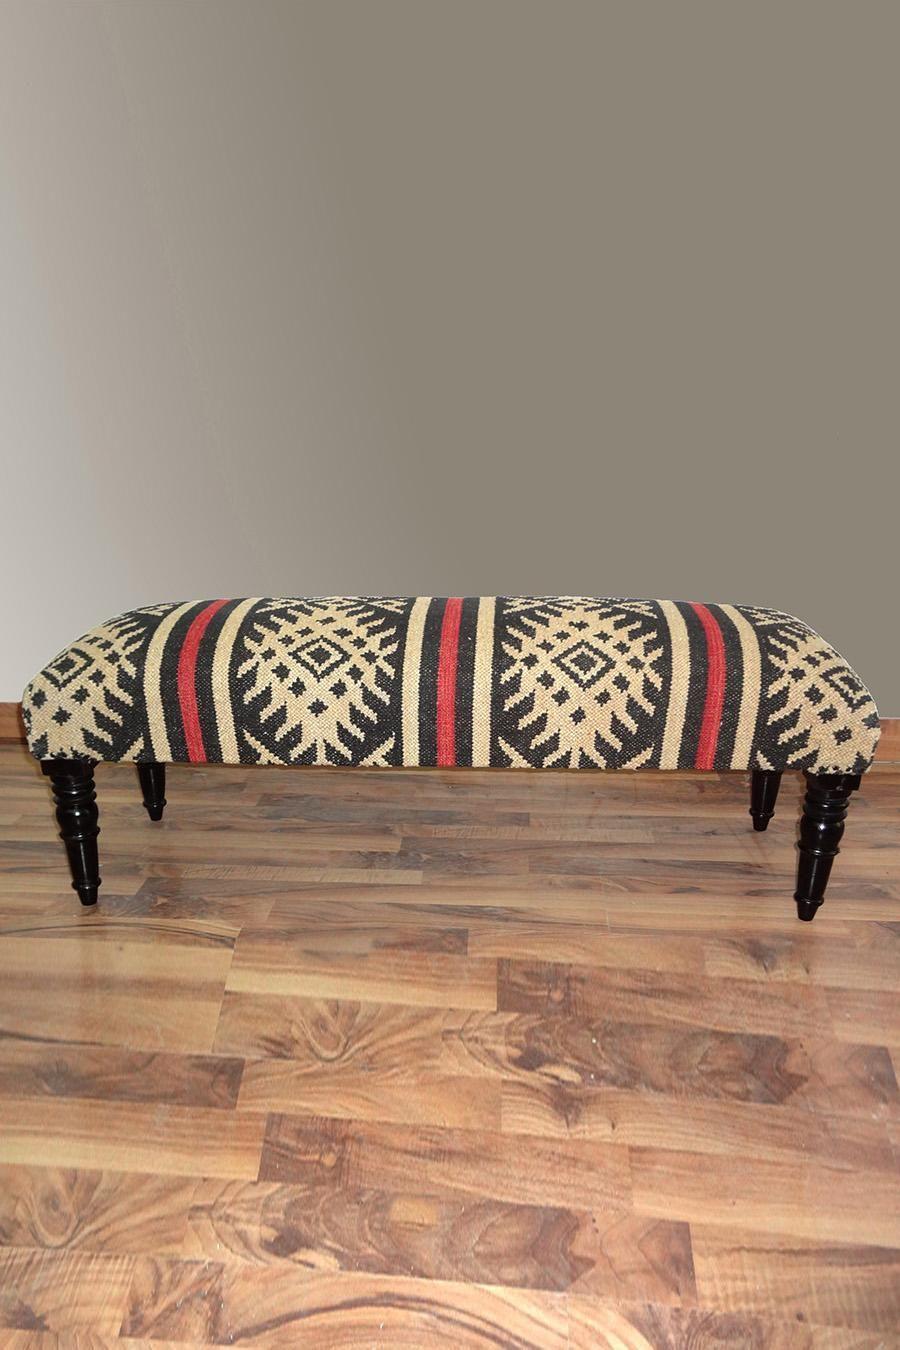 Nuloom Aztec Wooden Bench